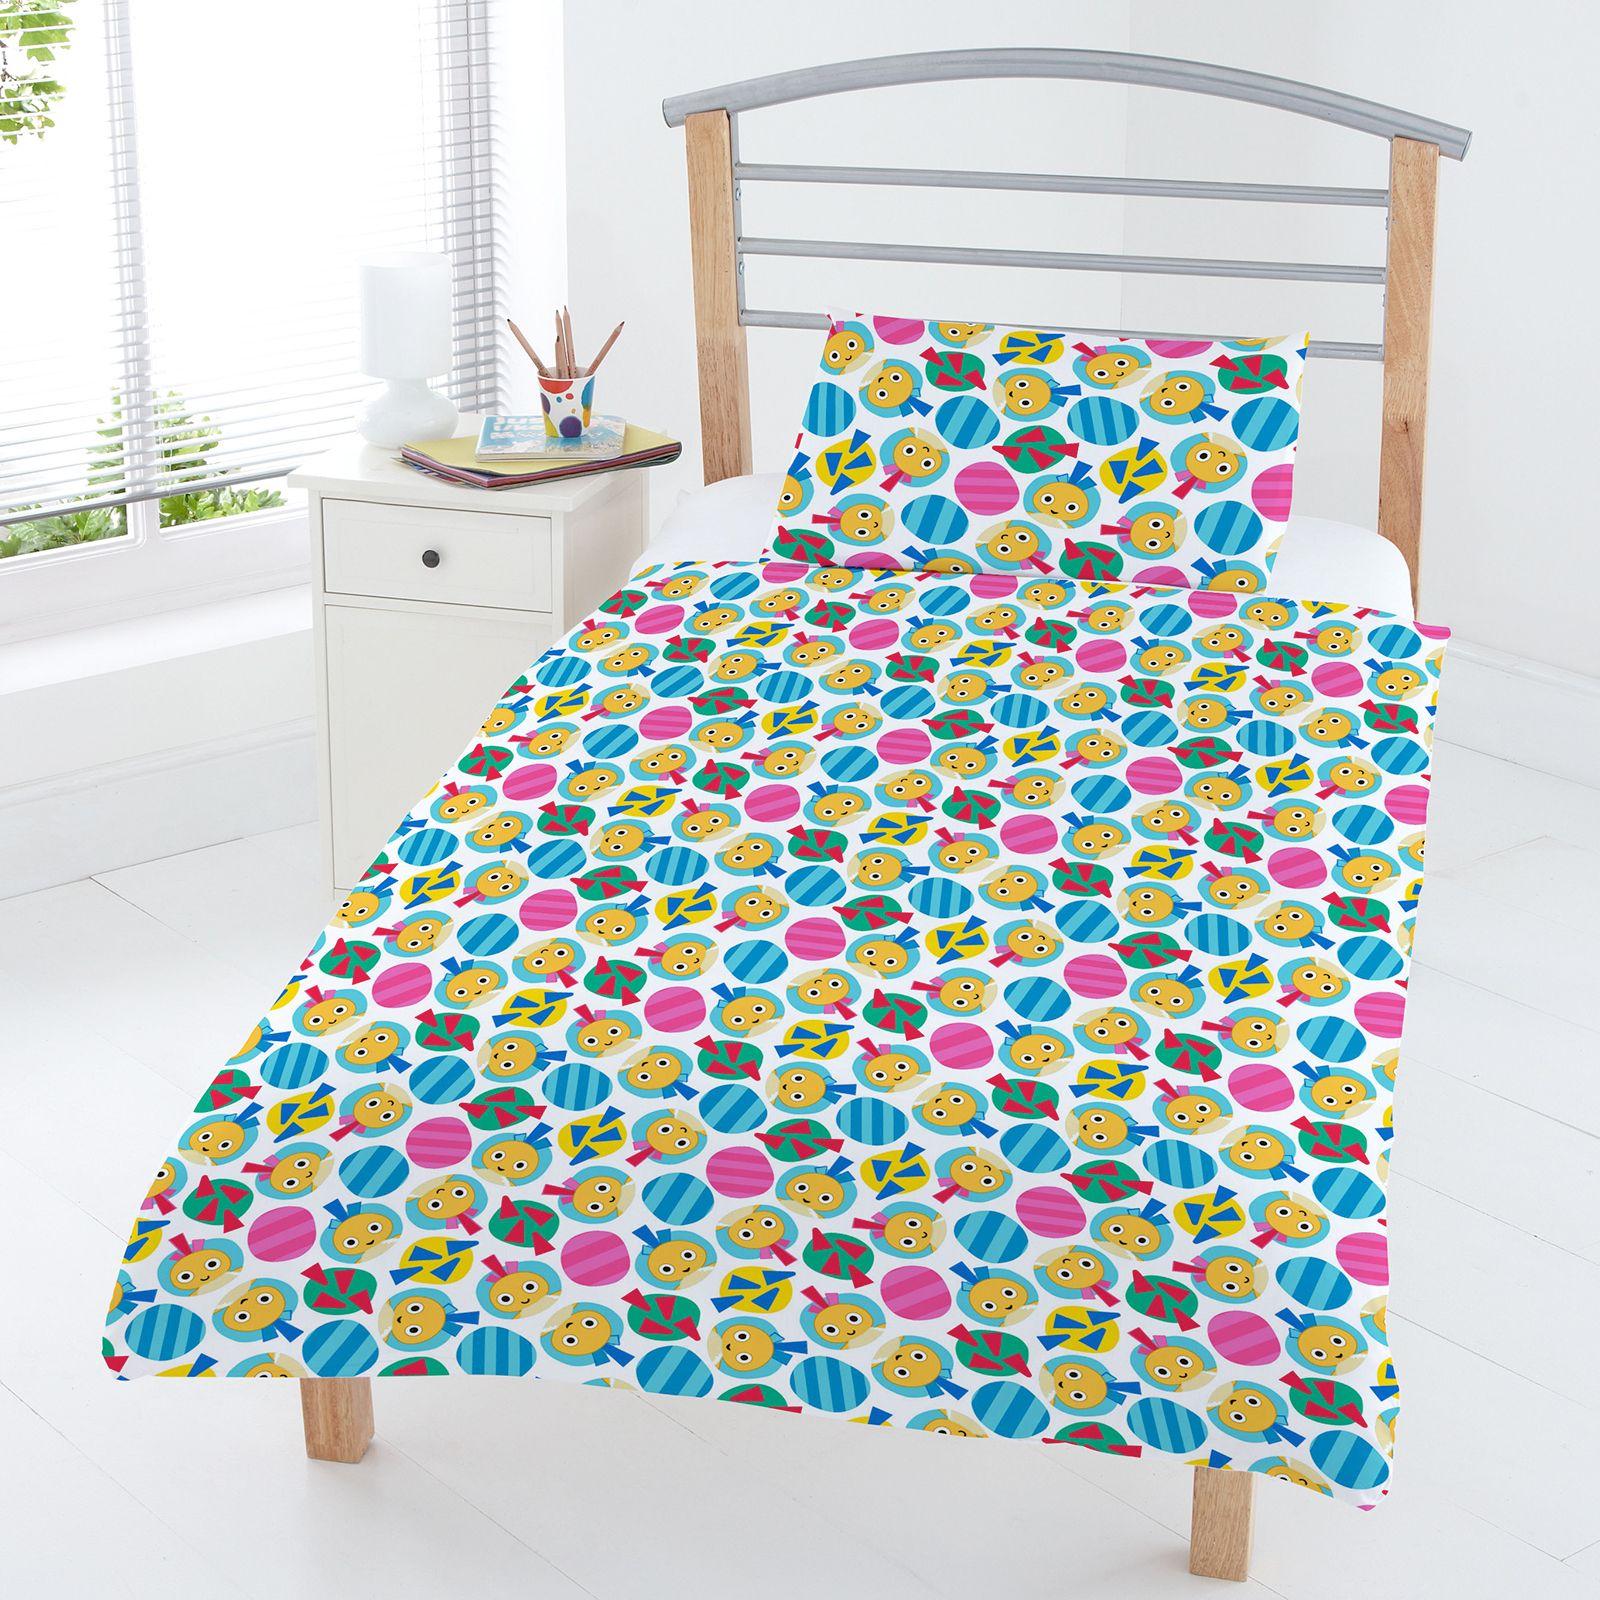 Junior 4 In 1 Bedding Bundles Duvet Pillow Covers